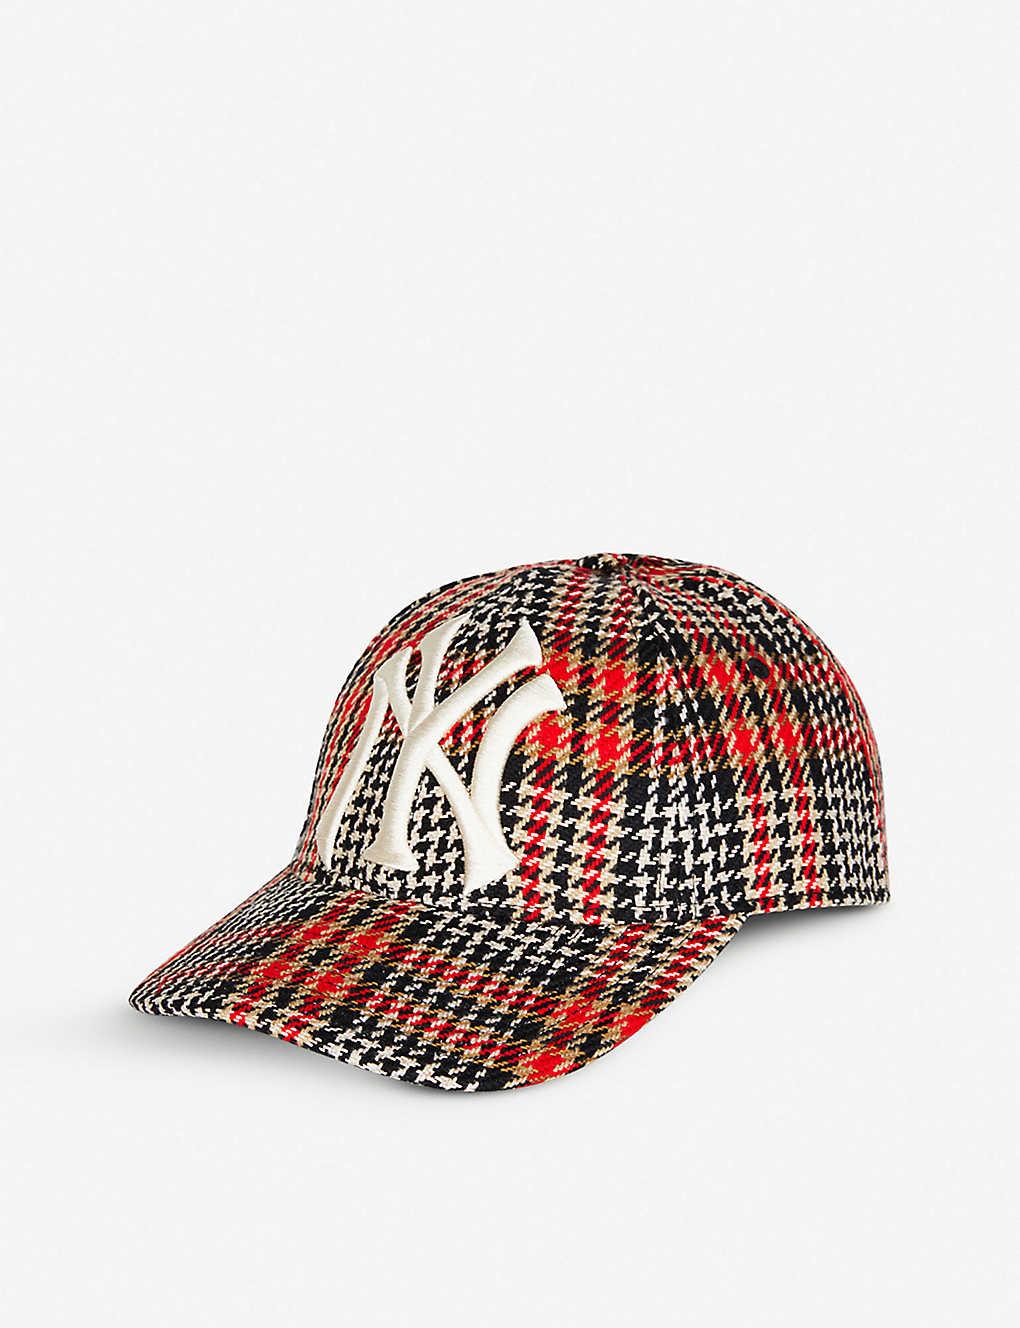 95d807e12 GUCCI - New York Yankees™ checked woven baseball cap   Selfridges.com